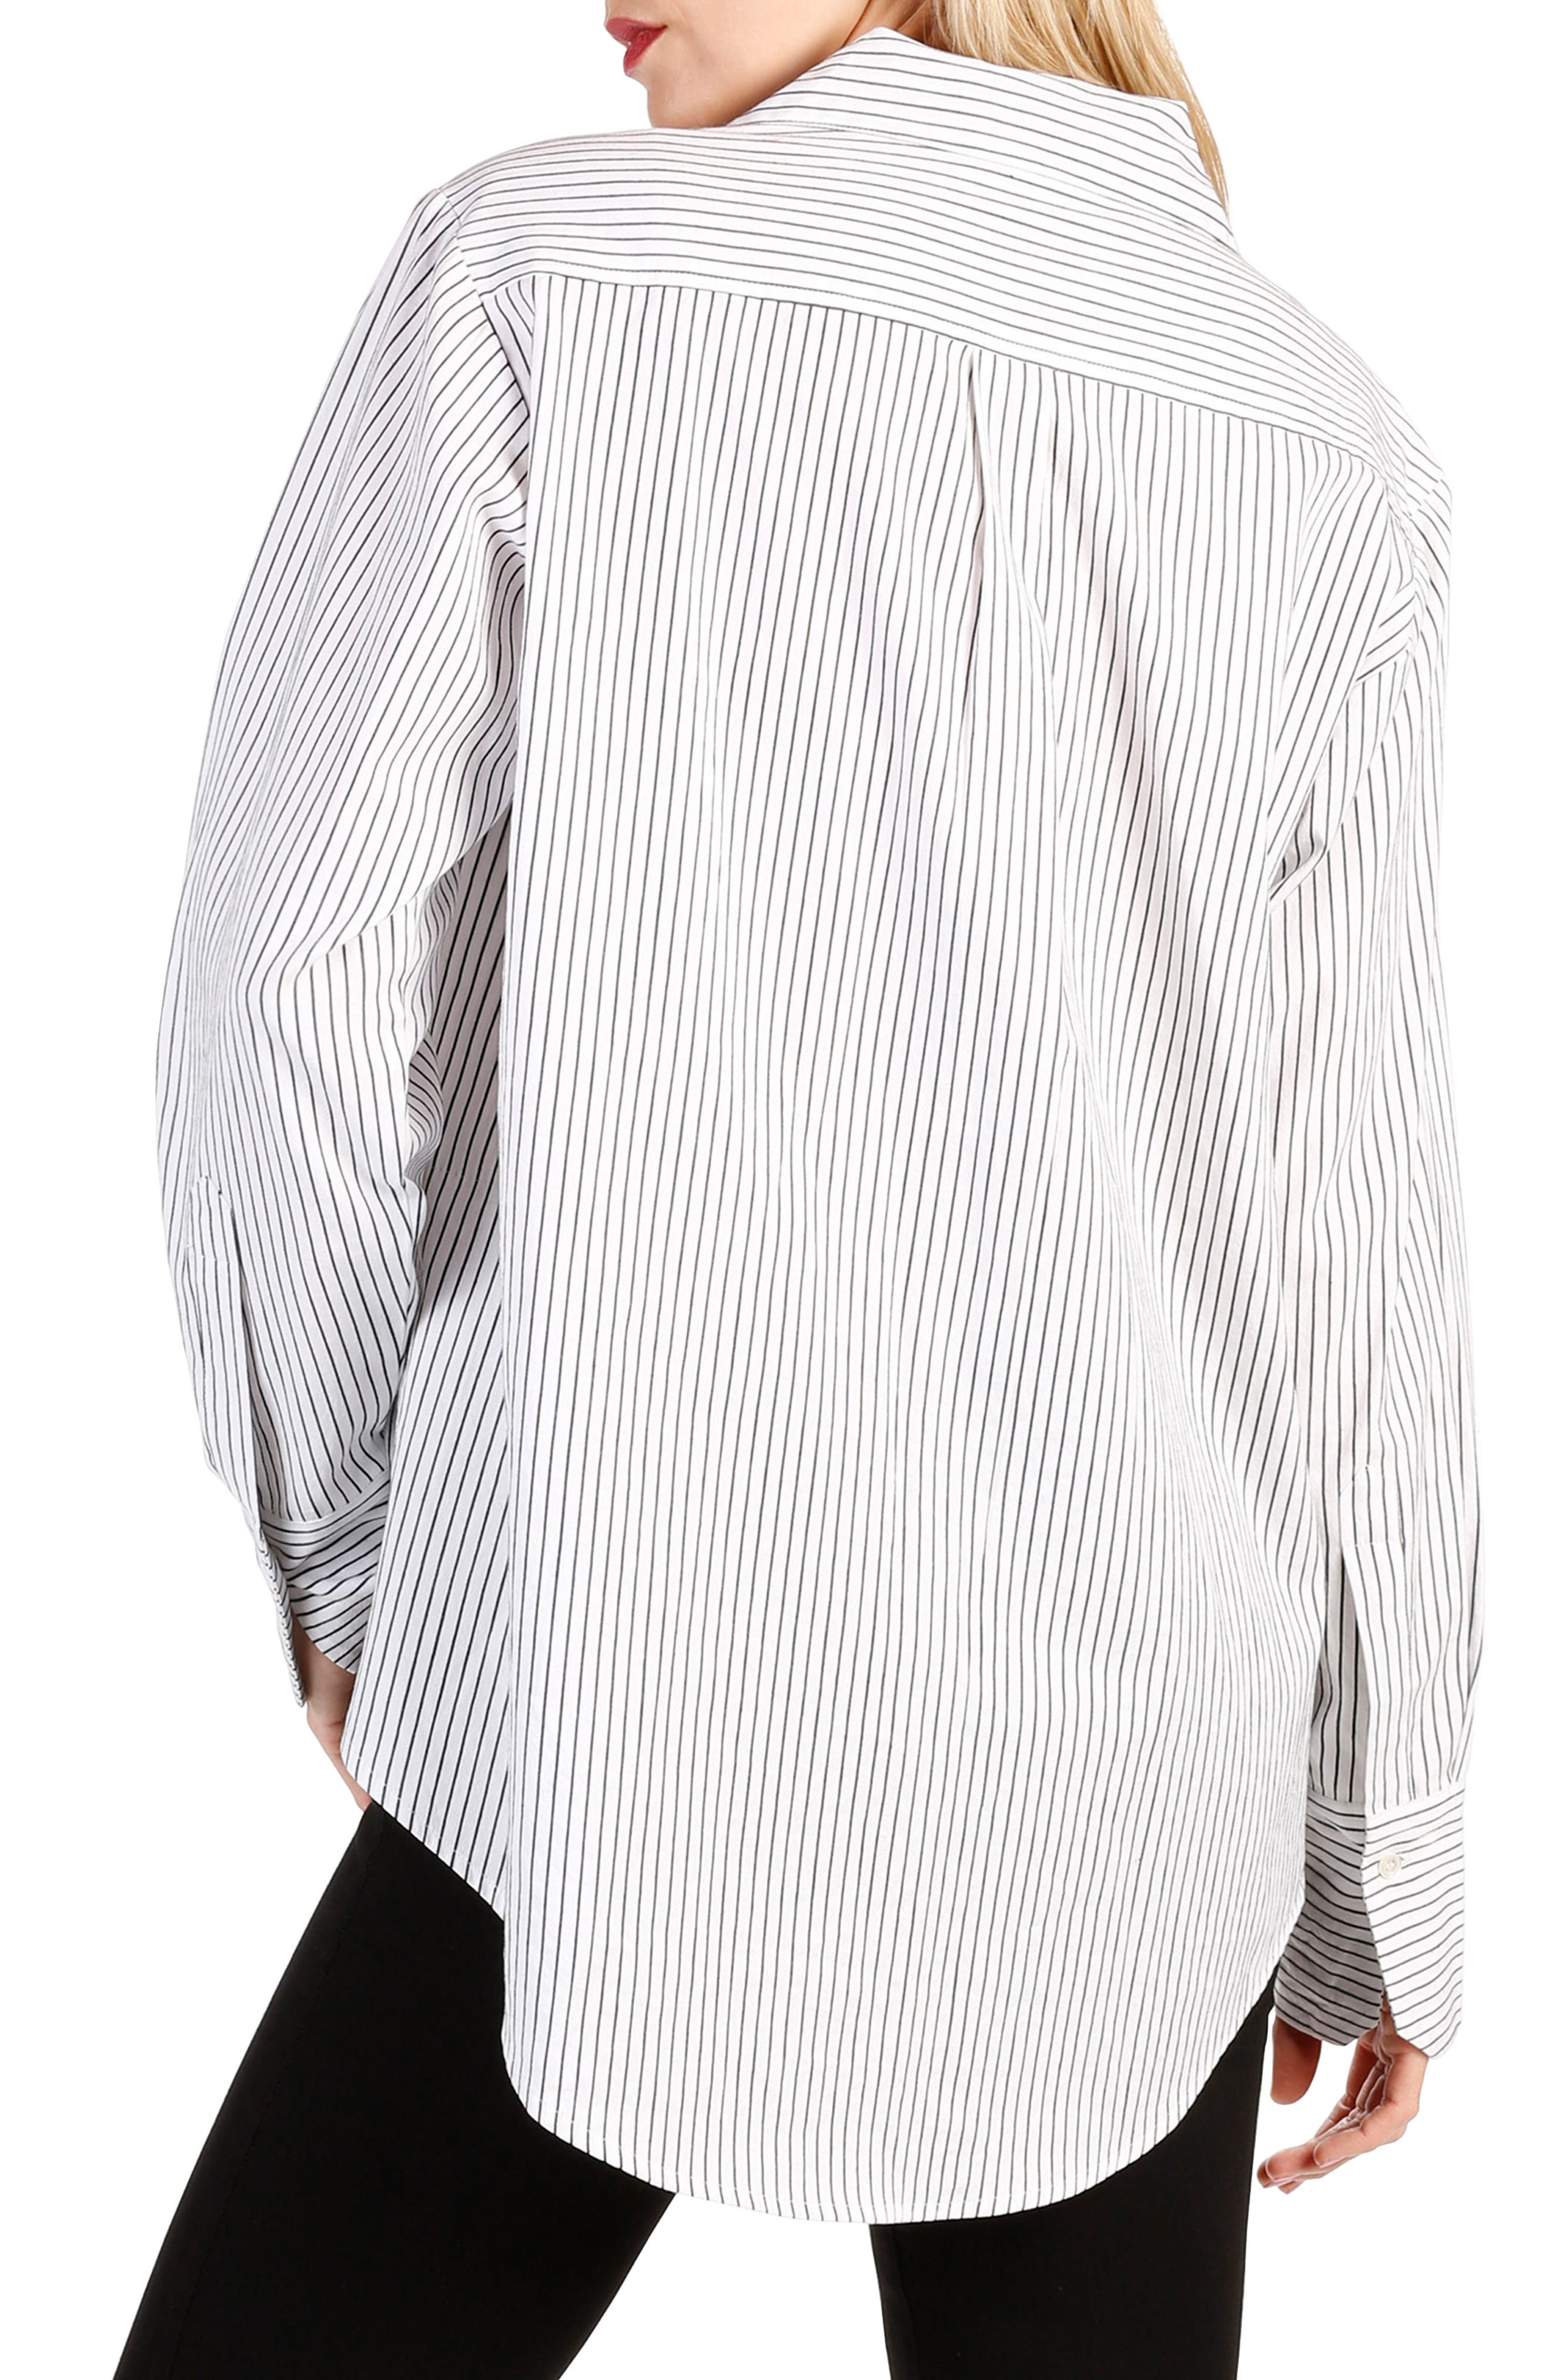 Clemence Stripe Shirt,                             Alternate thumbnail 2, color,                             Black And White Stripe